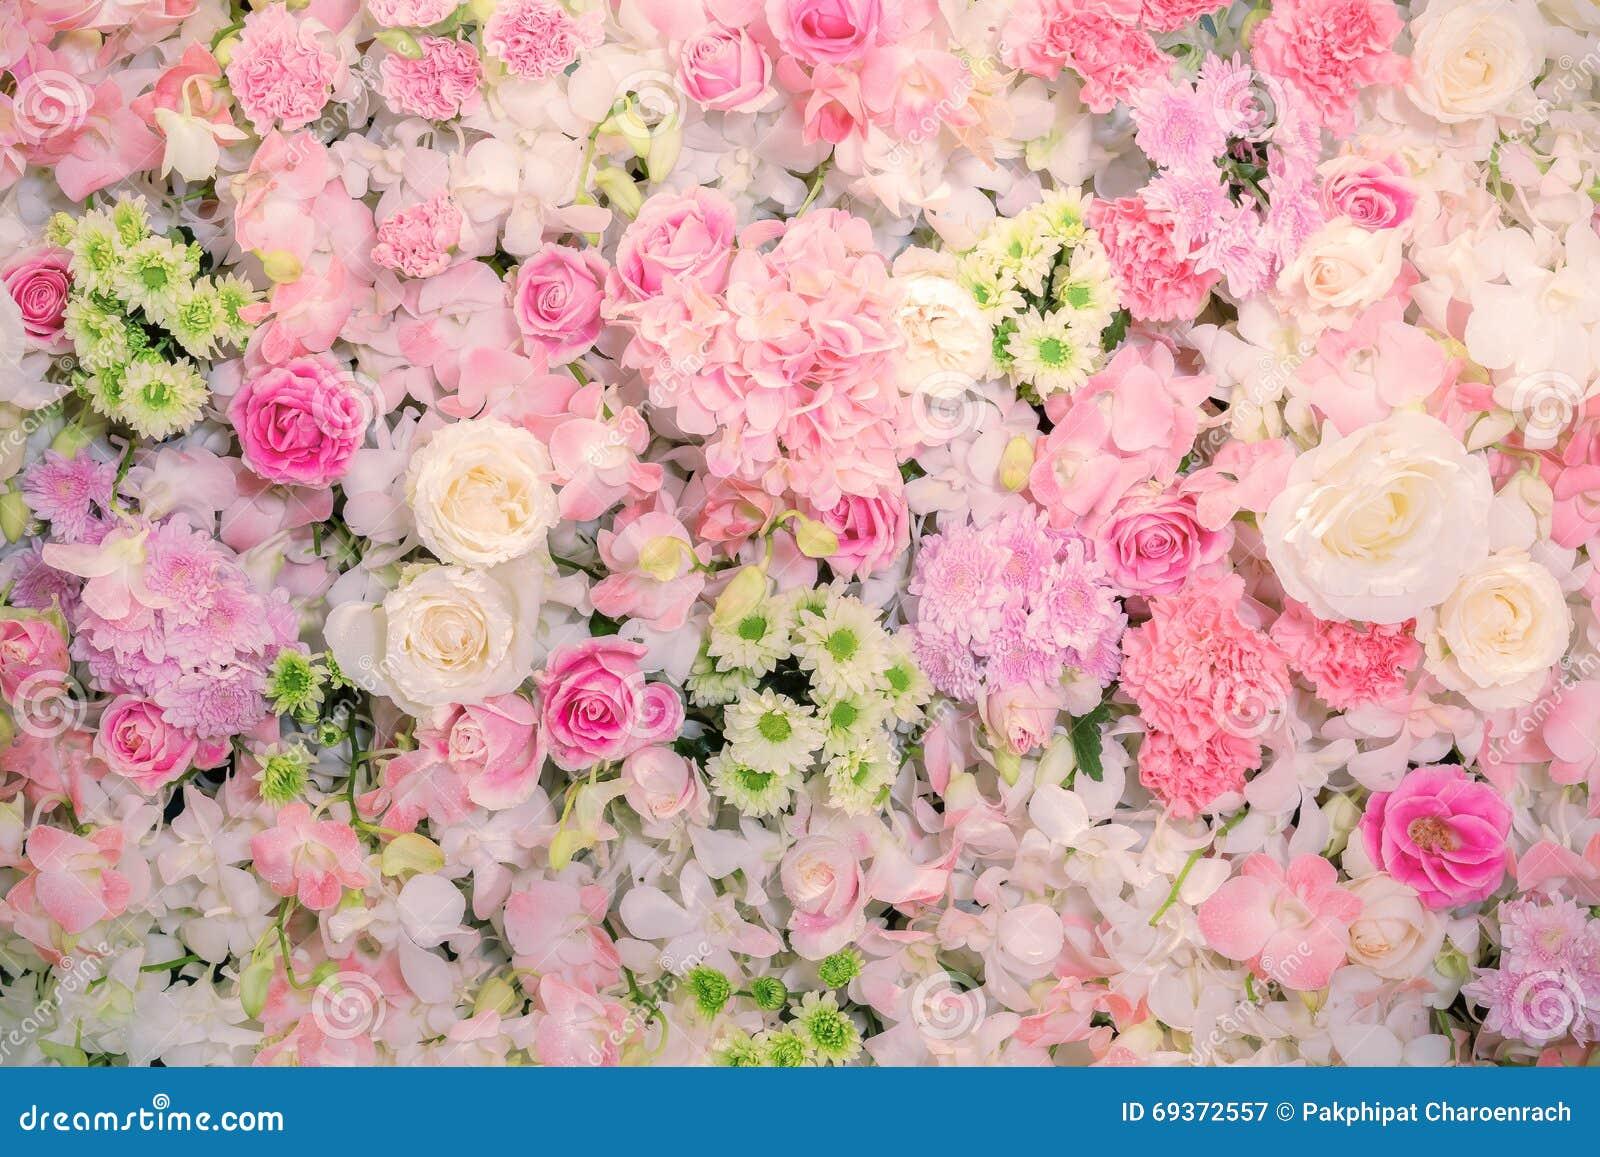 Beautiful flowers background for wedding scene stock image image download beautiful flowers background for wedding scene stock image image of green flora izmirmasajfo